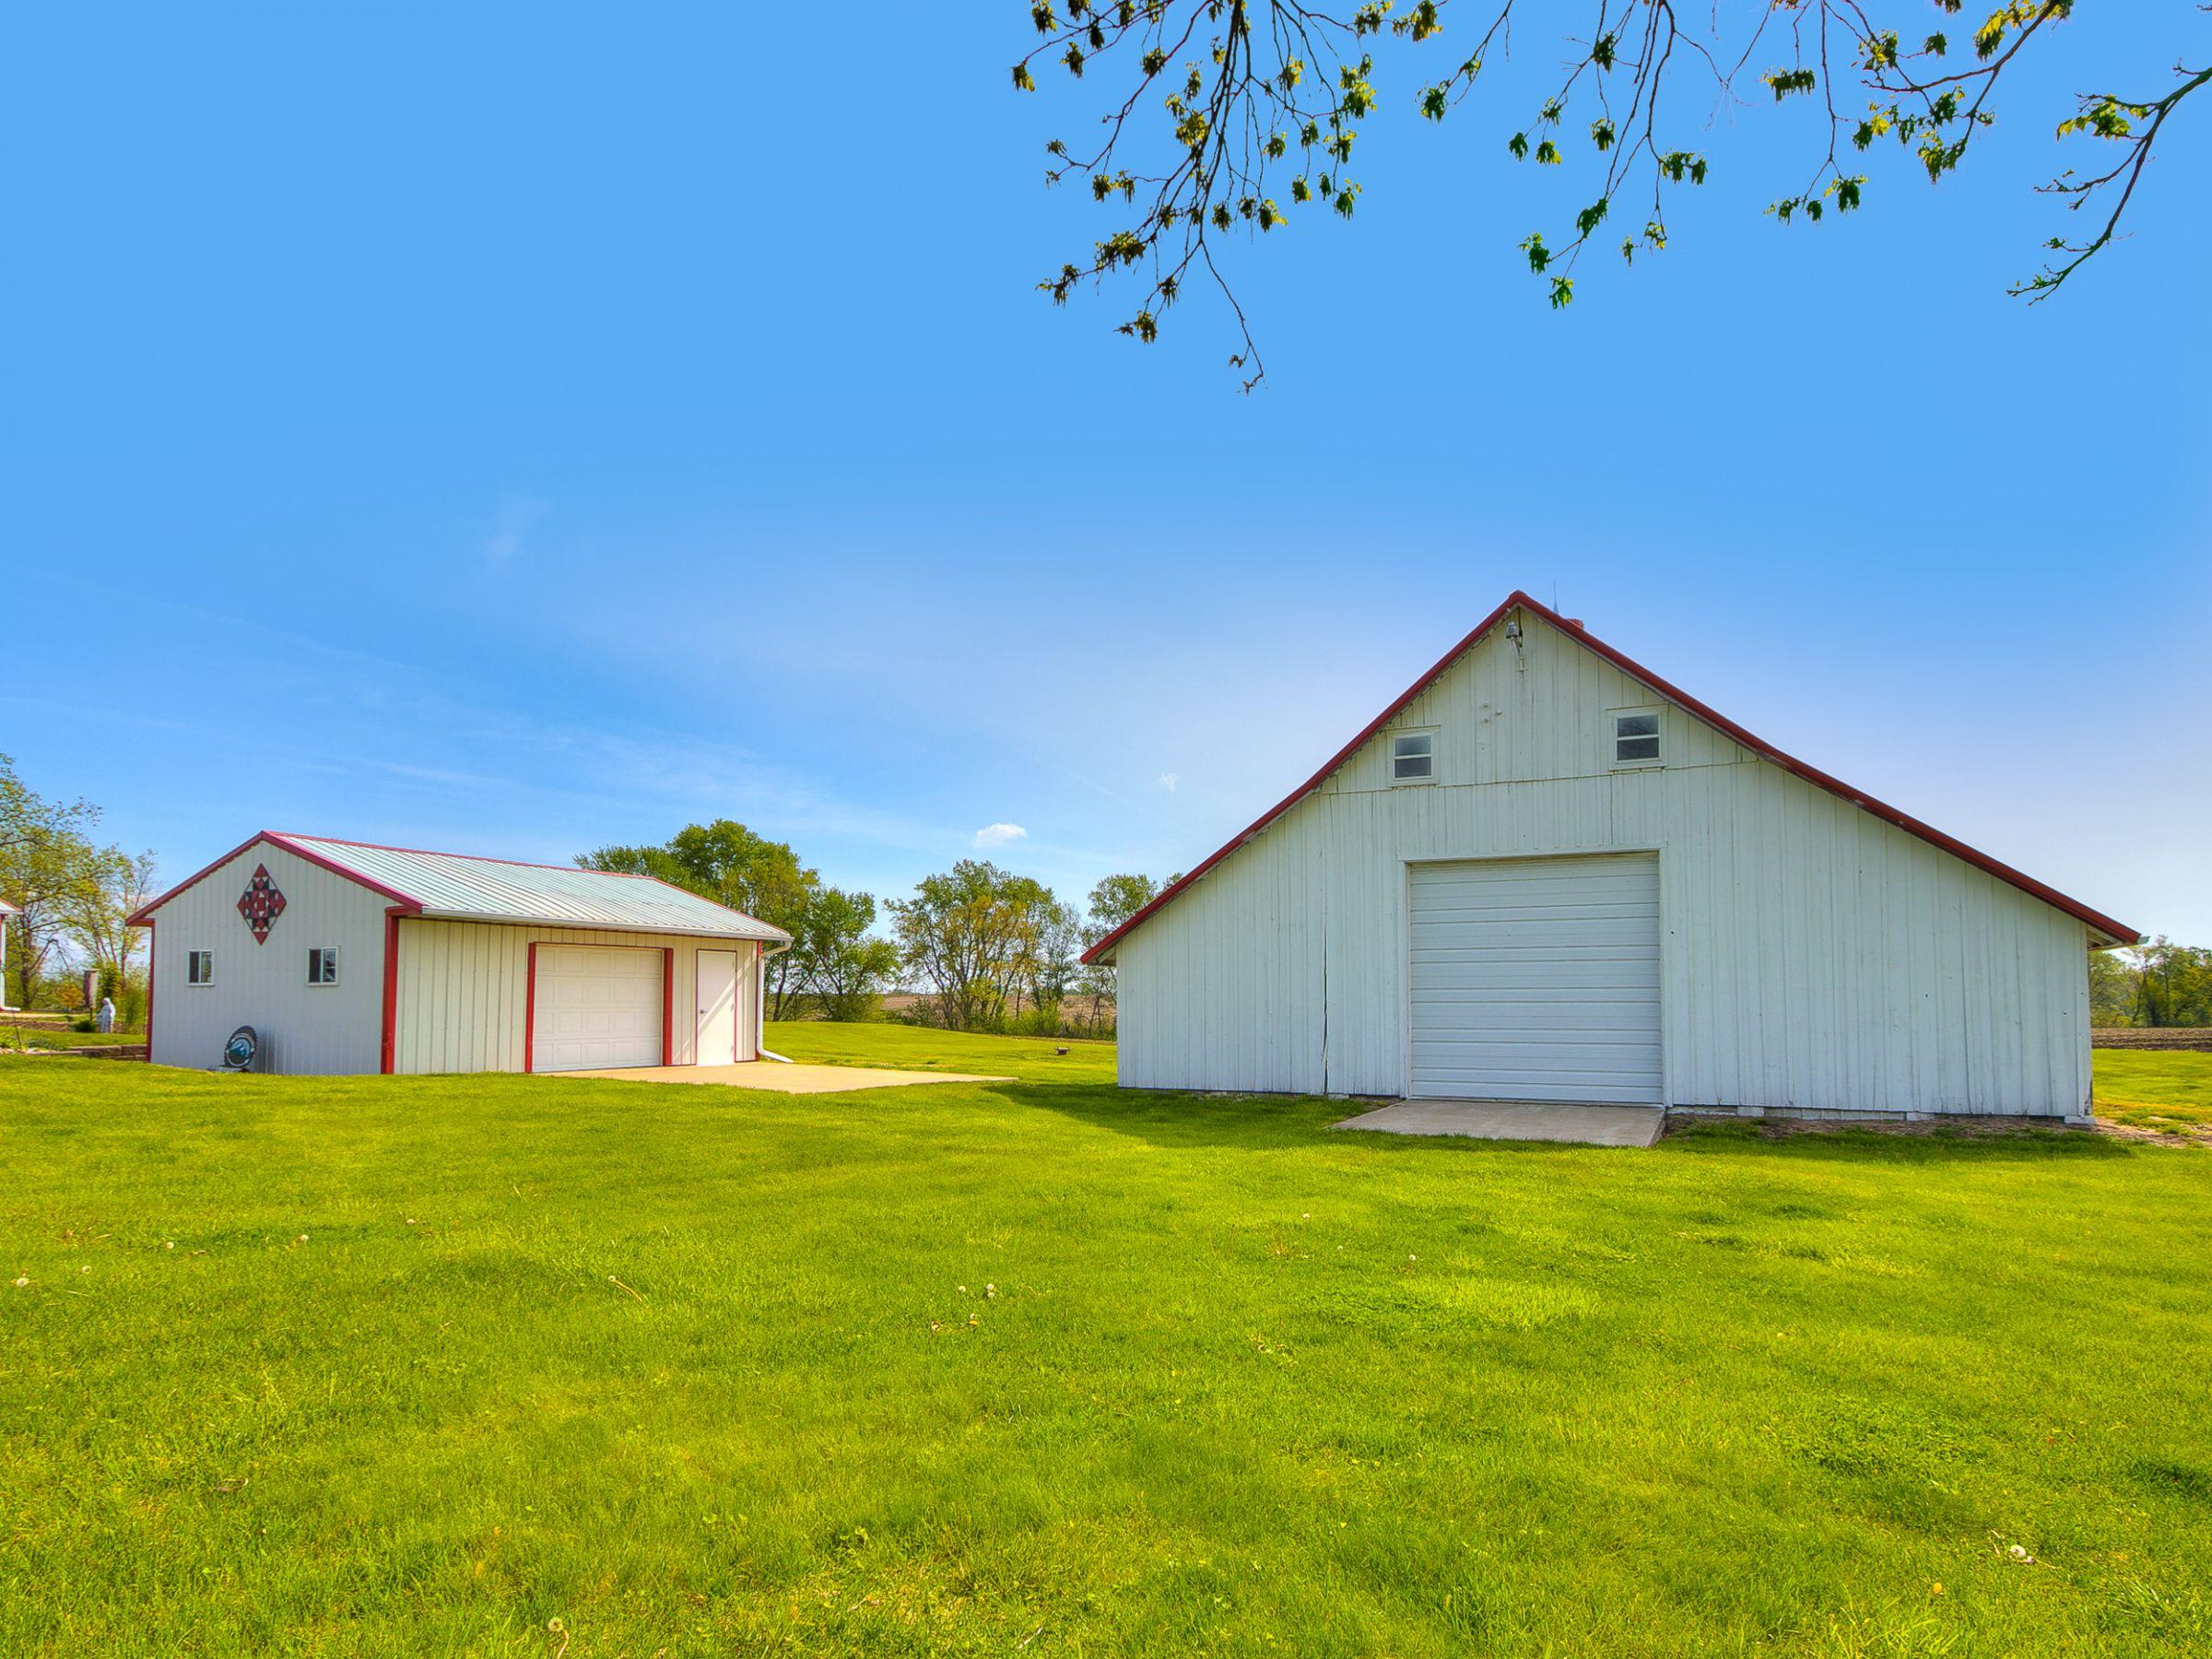 residential-warren-county-iowa-3-acres-listing-number-15516-2-2021-05-12-144747.jpg